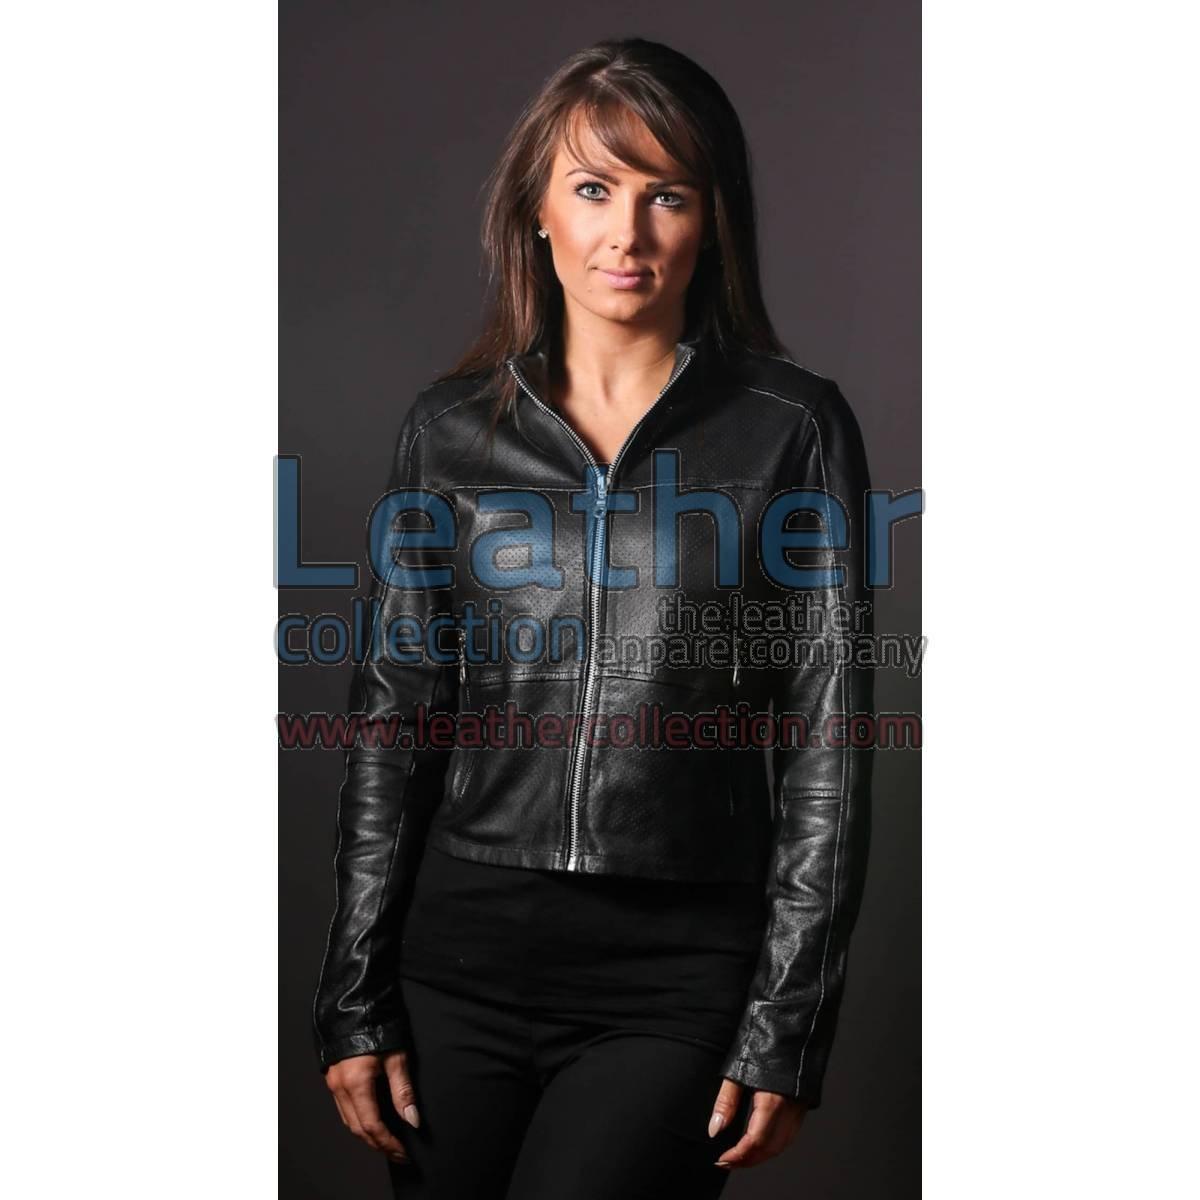 Women LeatherFashion Steel jacket